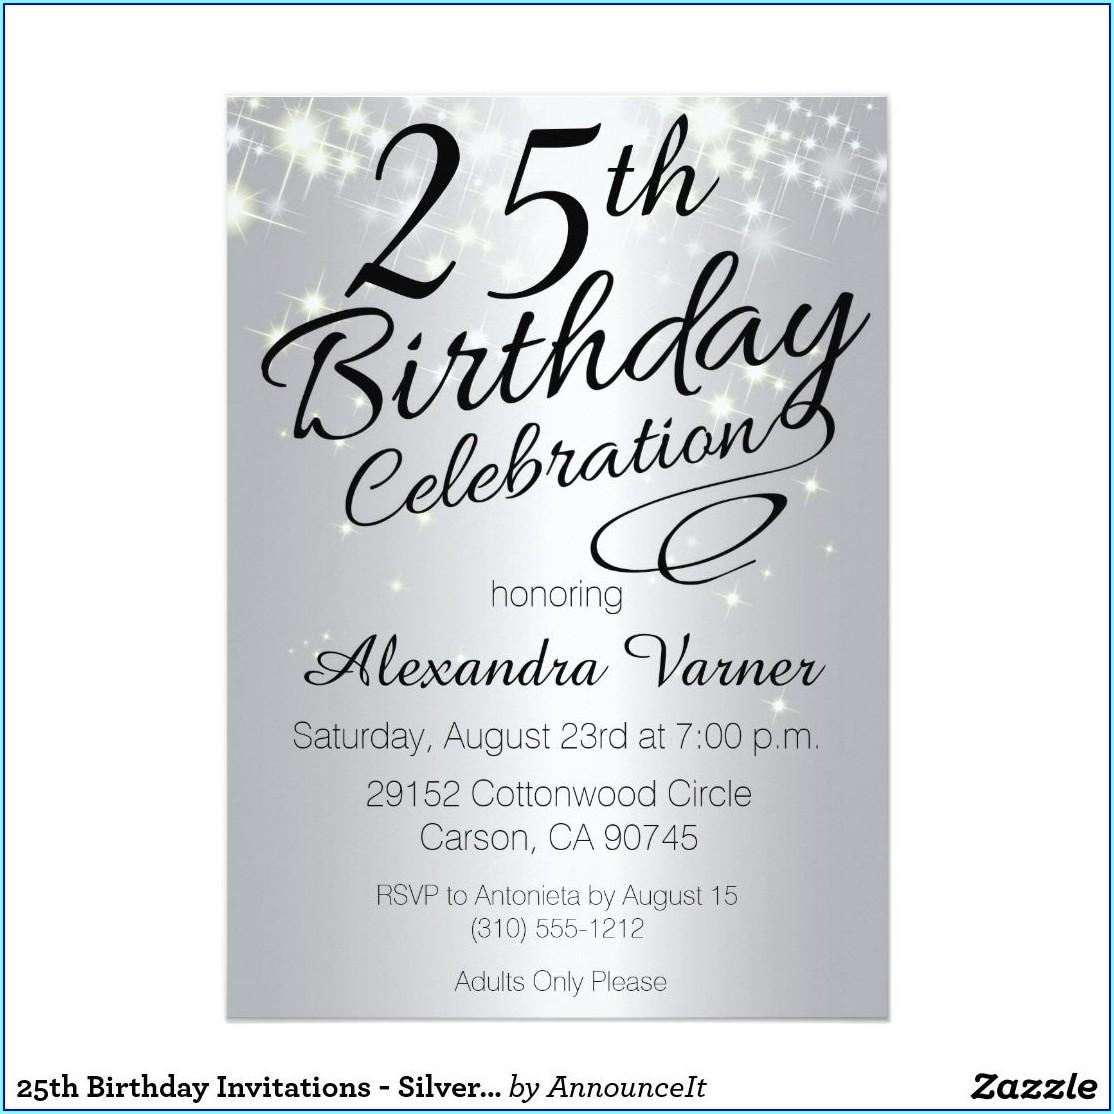 25th Birthday Invitations Online